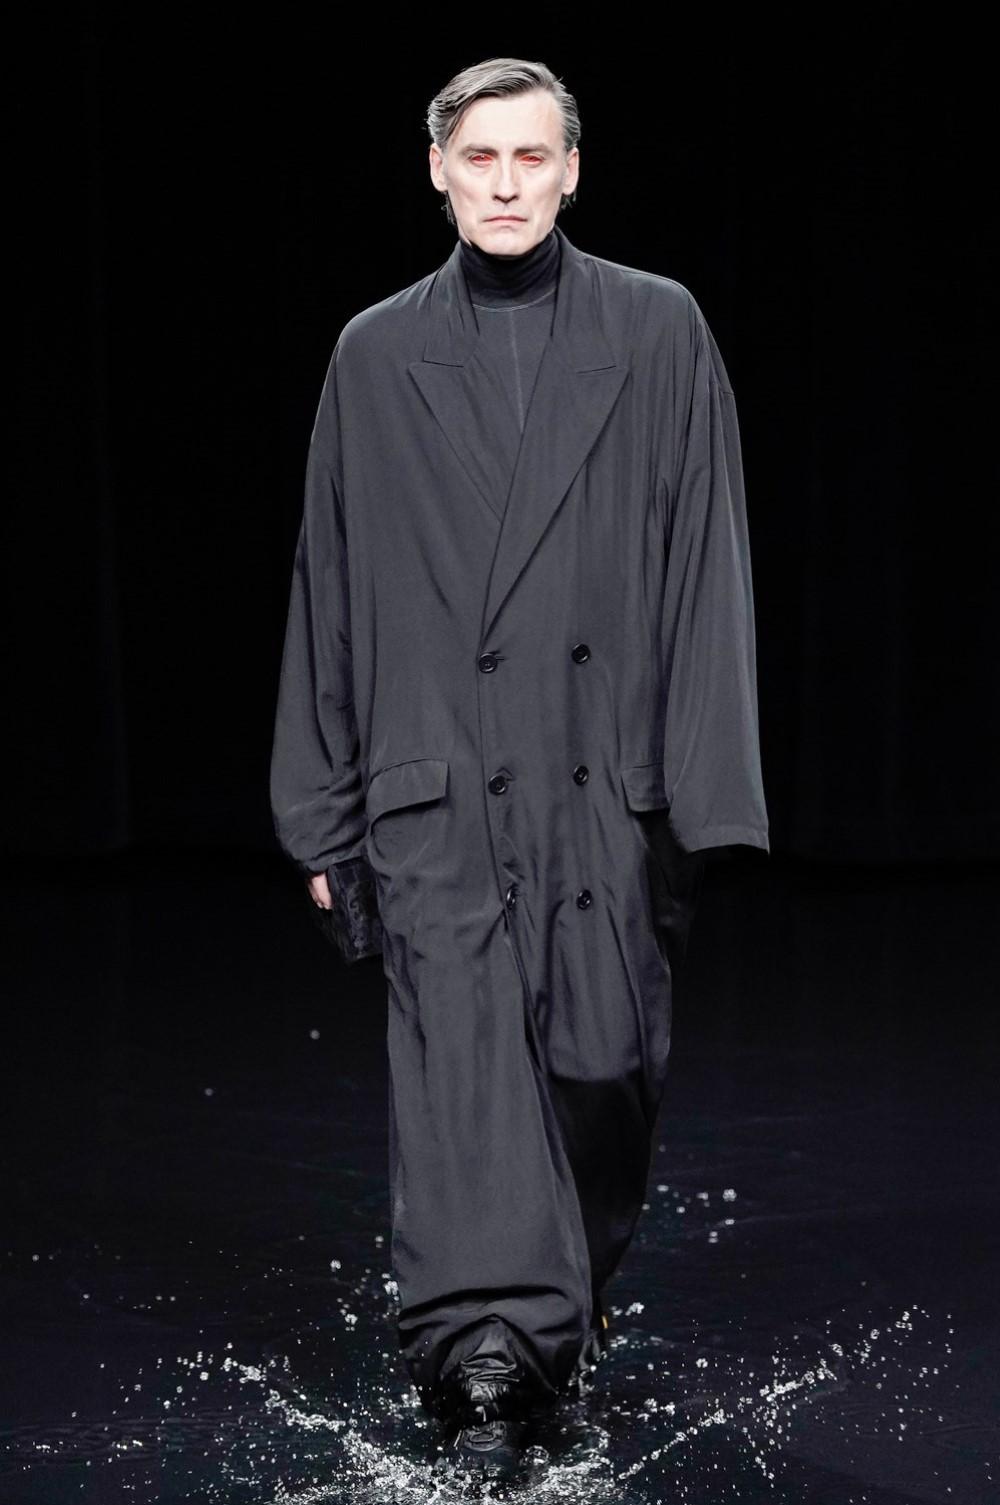 Balenciaga Automne-Hiver 2020-2021 - Paris Fashion Week